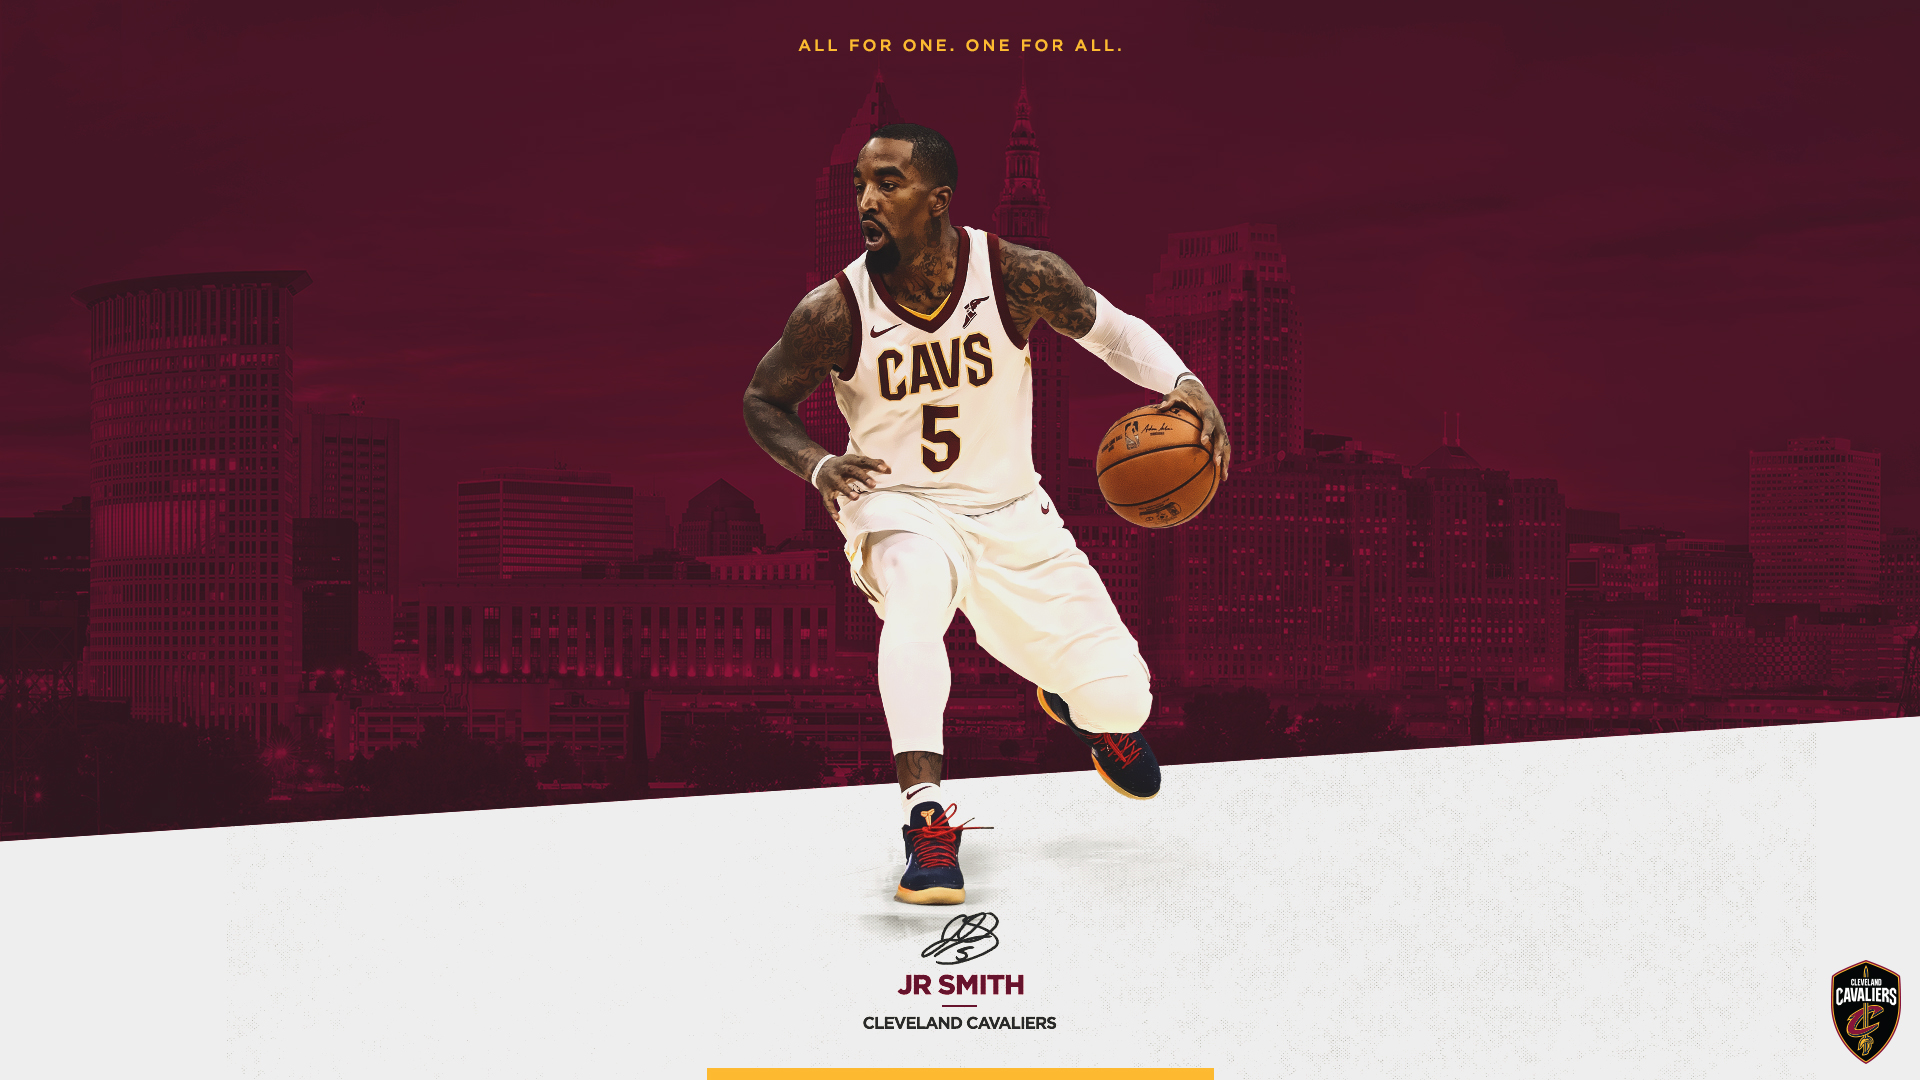 Live Basketball Wallpapers For Desktop - Lebron James 2017 18 , HD Wallpaper & Backgrounds